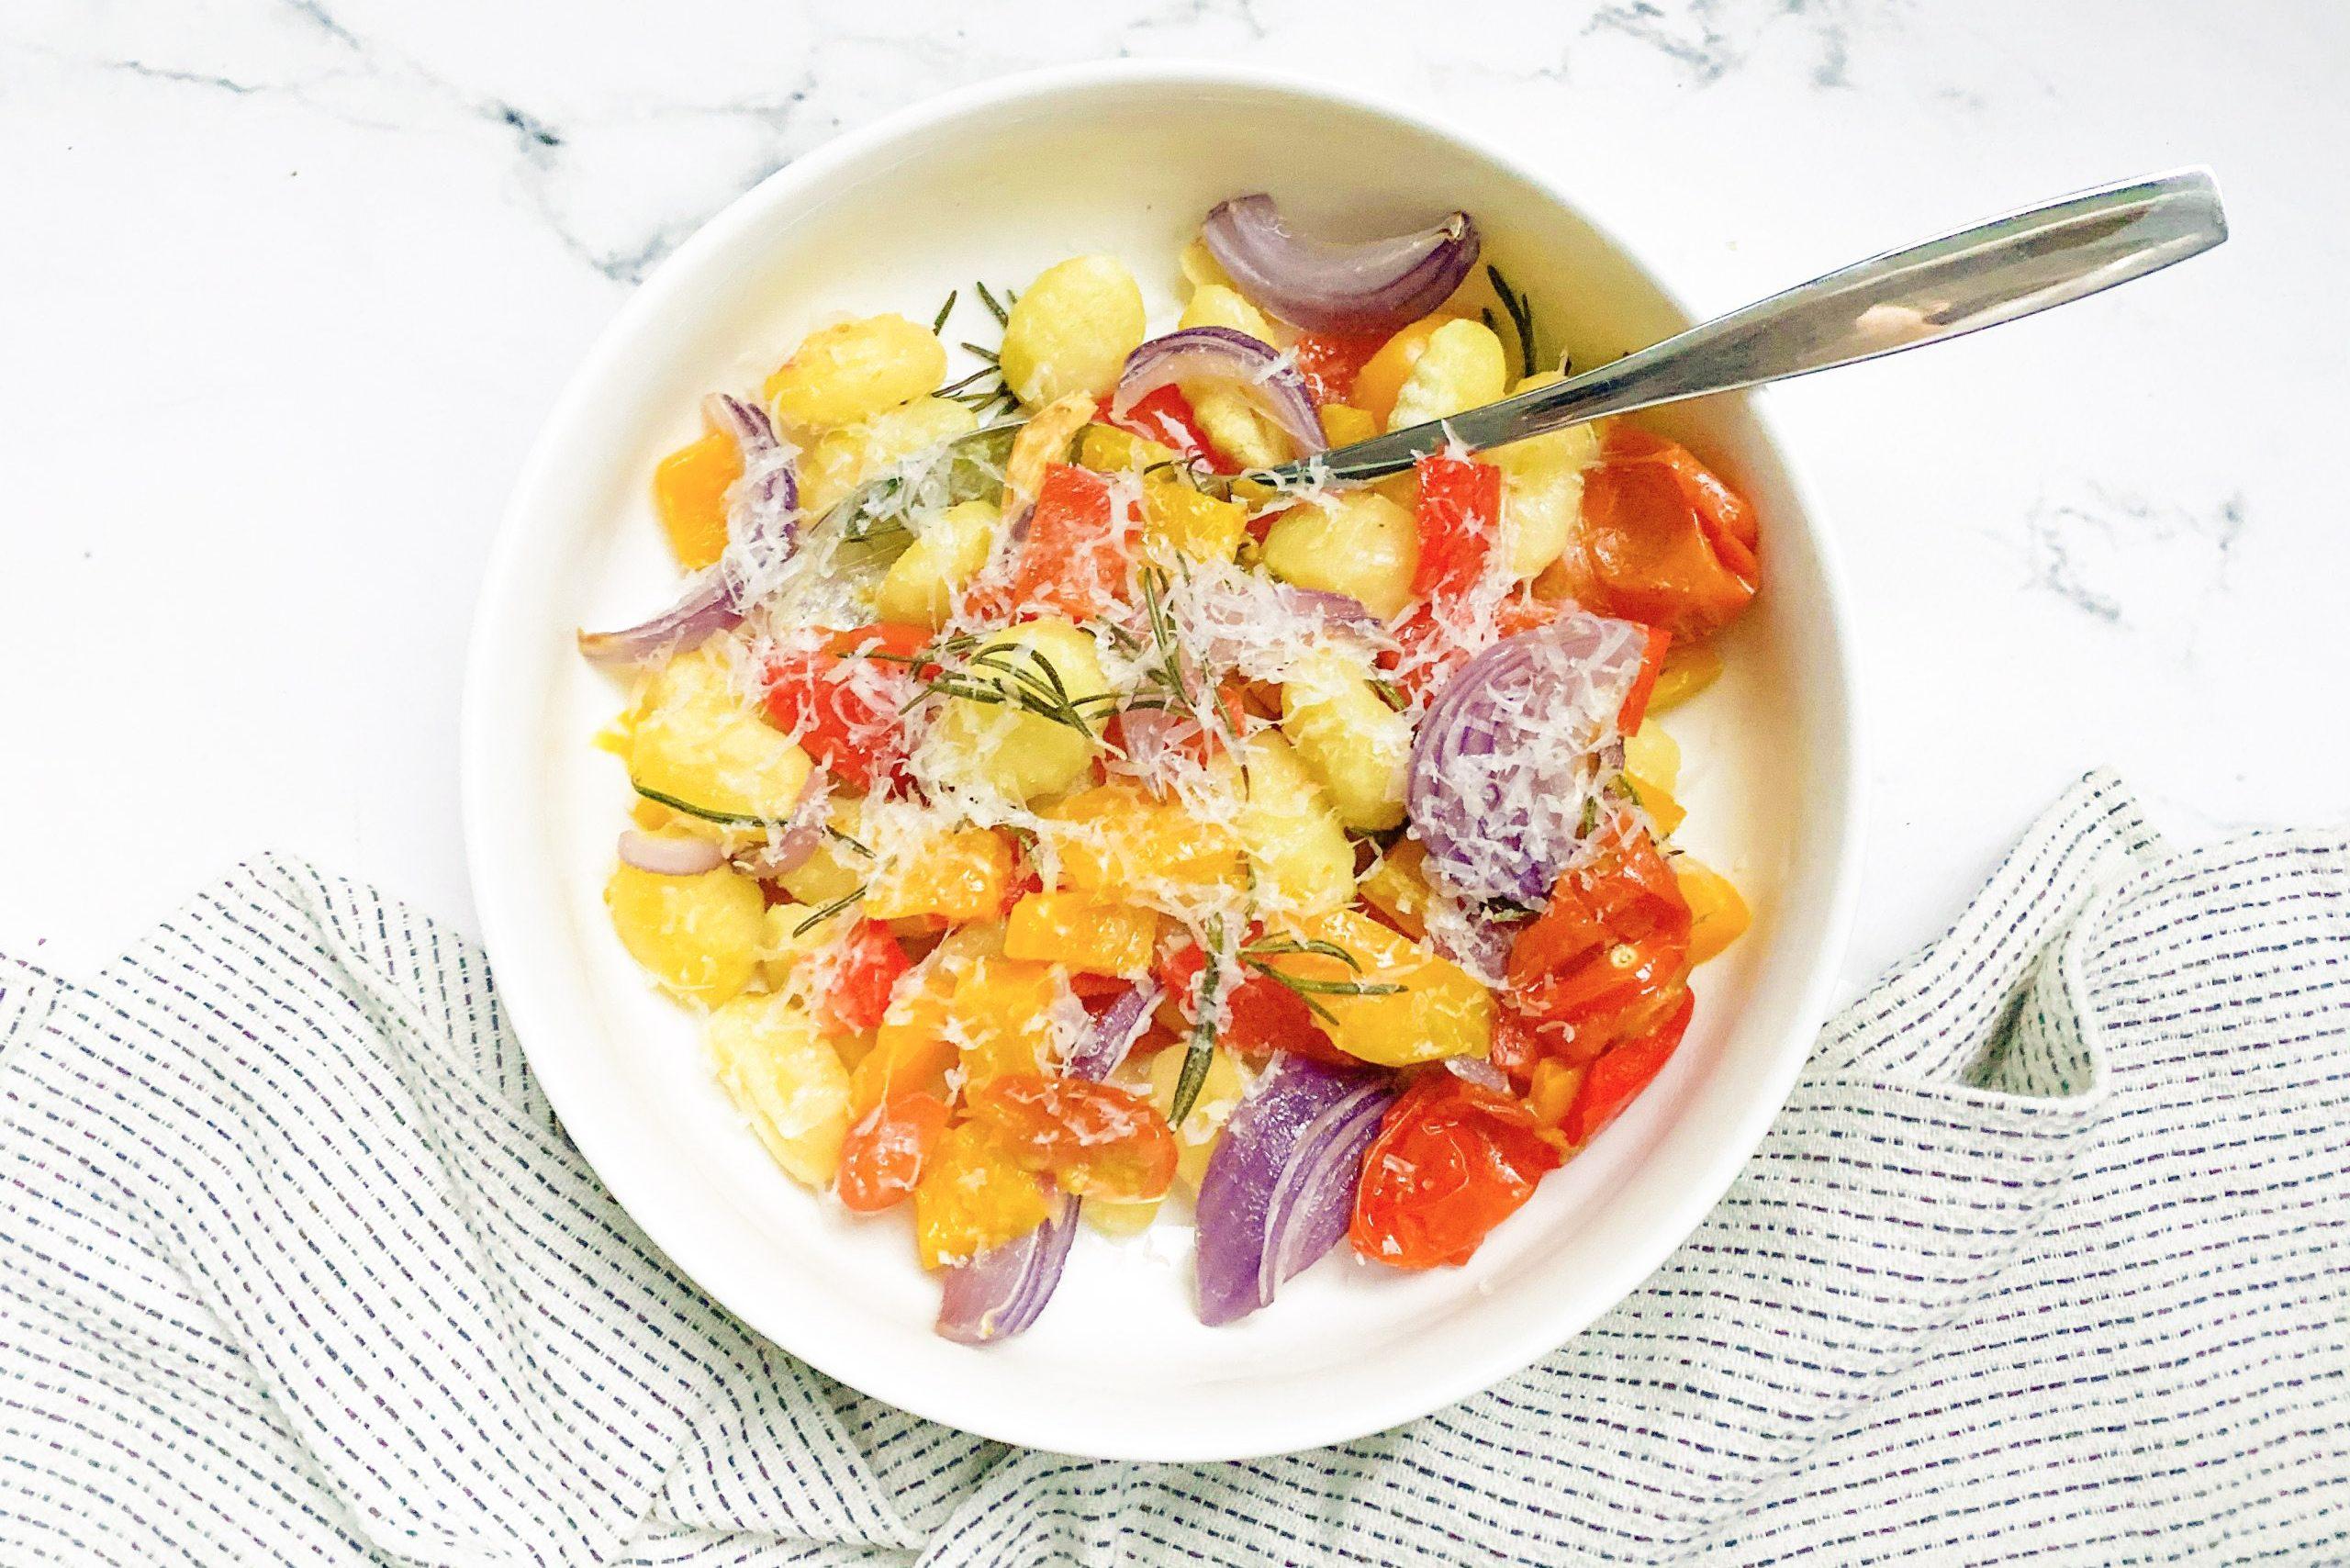 gnocchi met gegrilde groenten